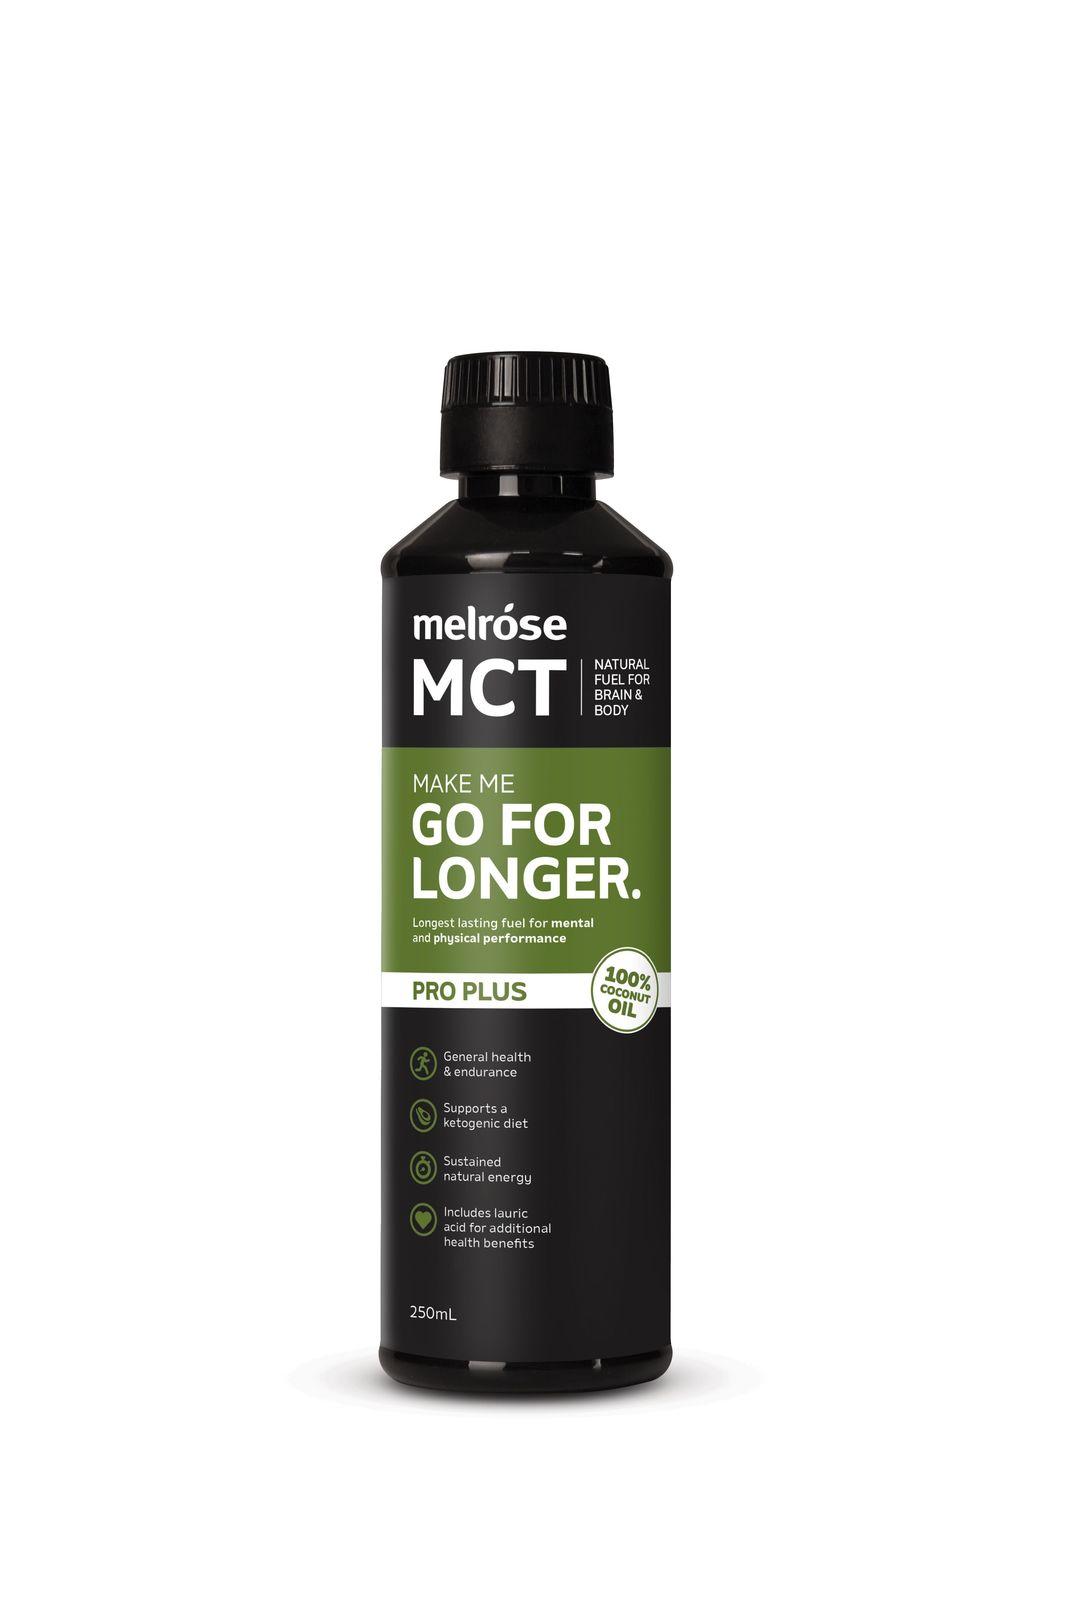 Melrose Pro Plus MCT Oil (250ml) image